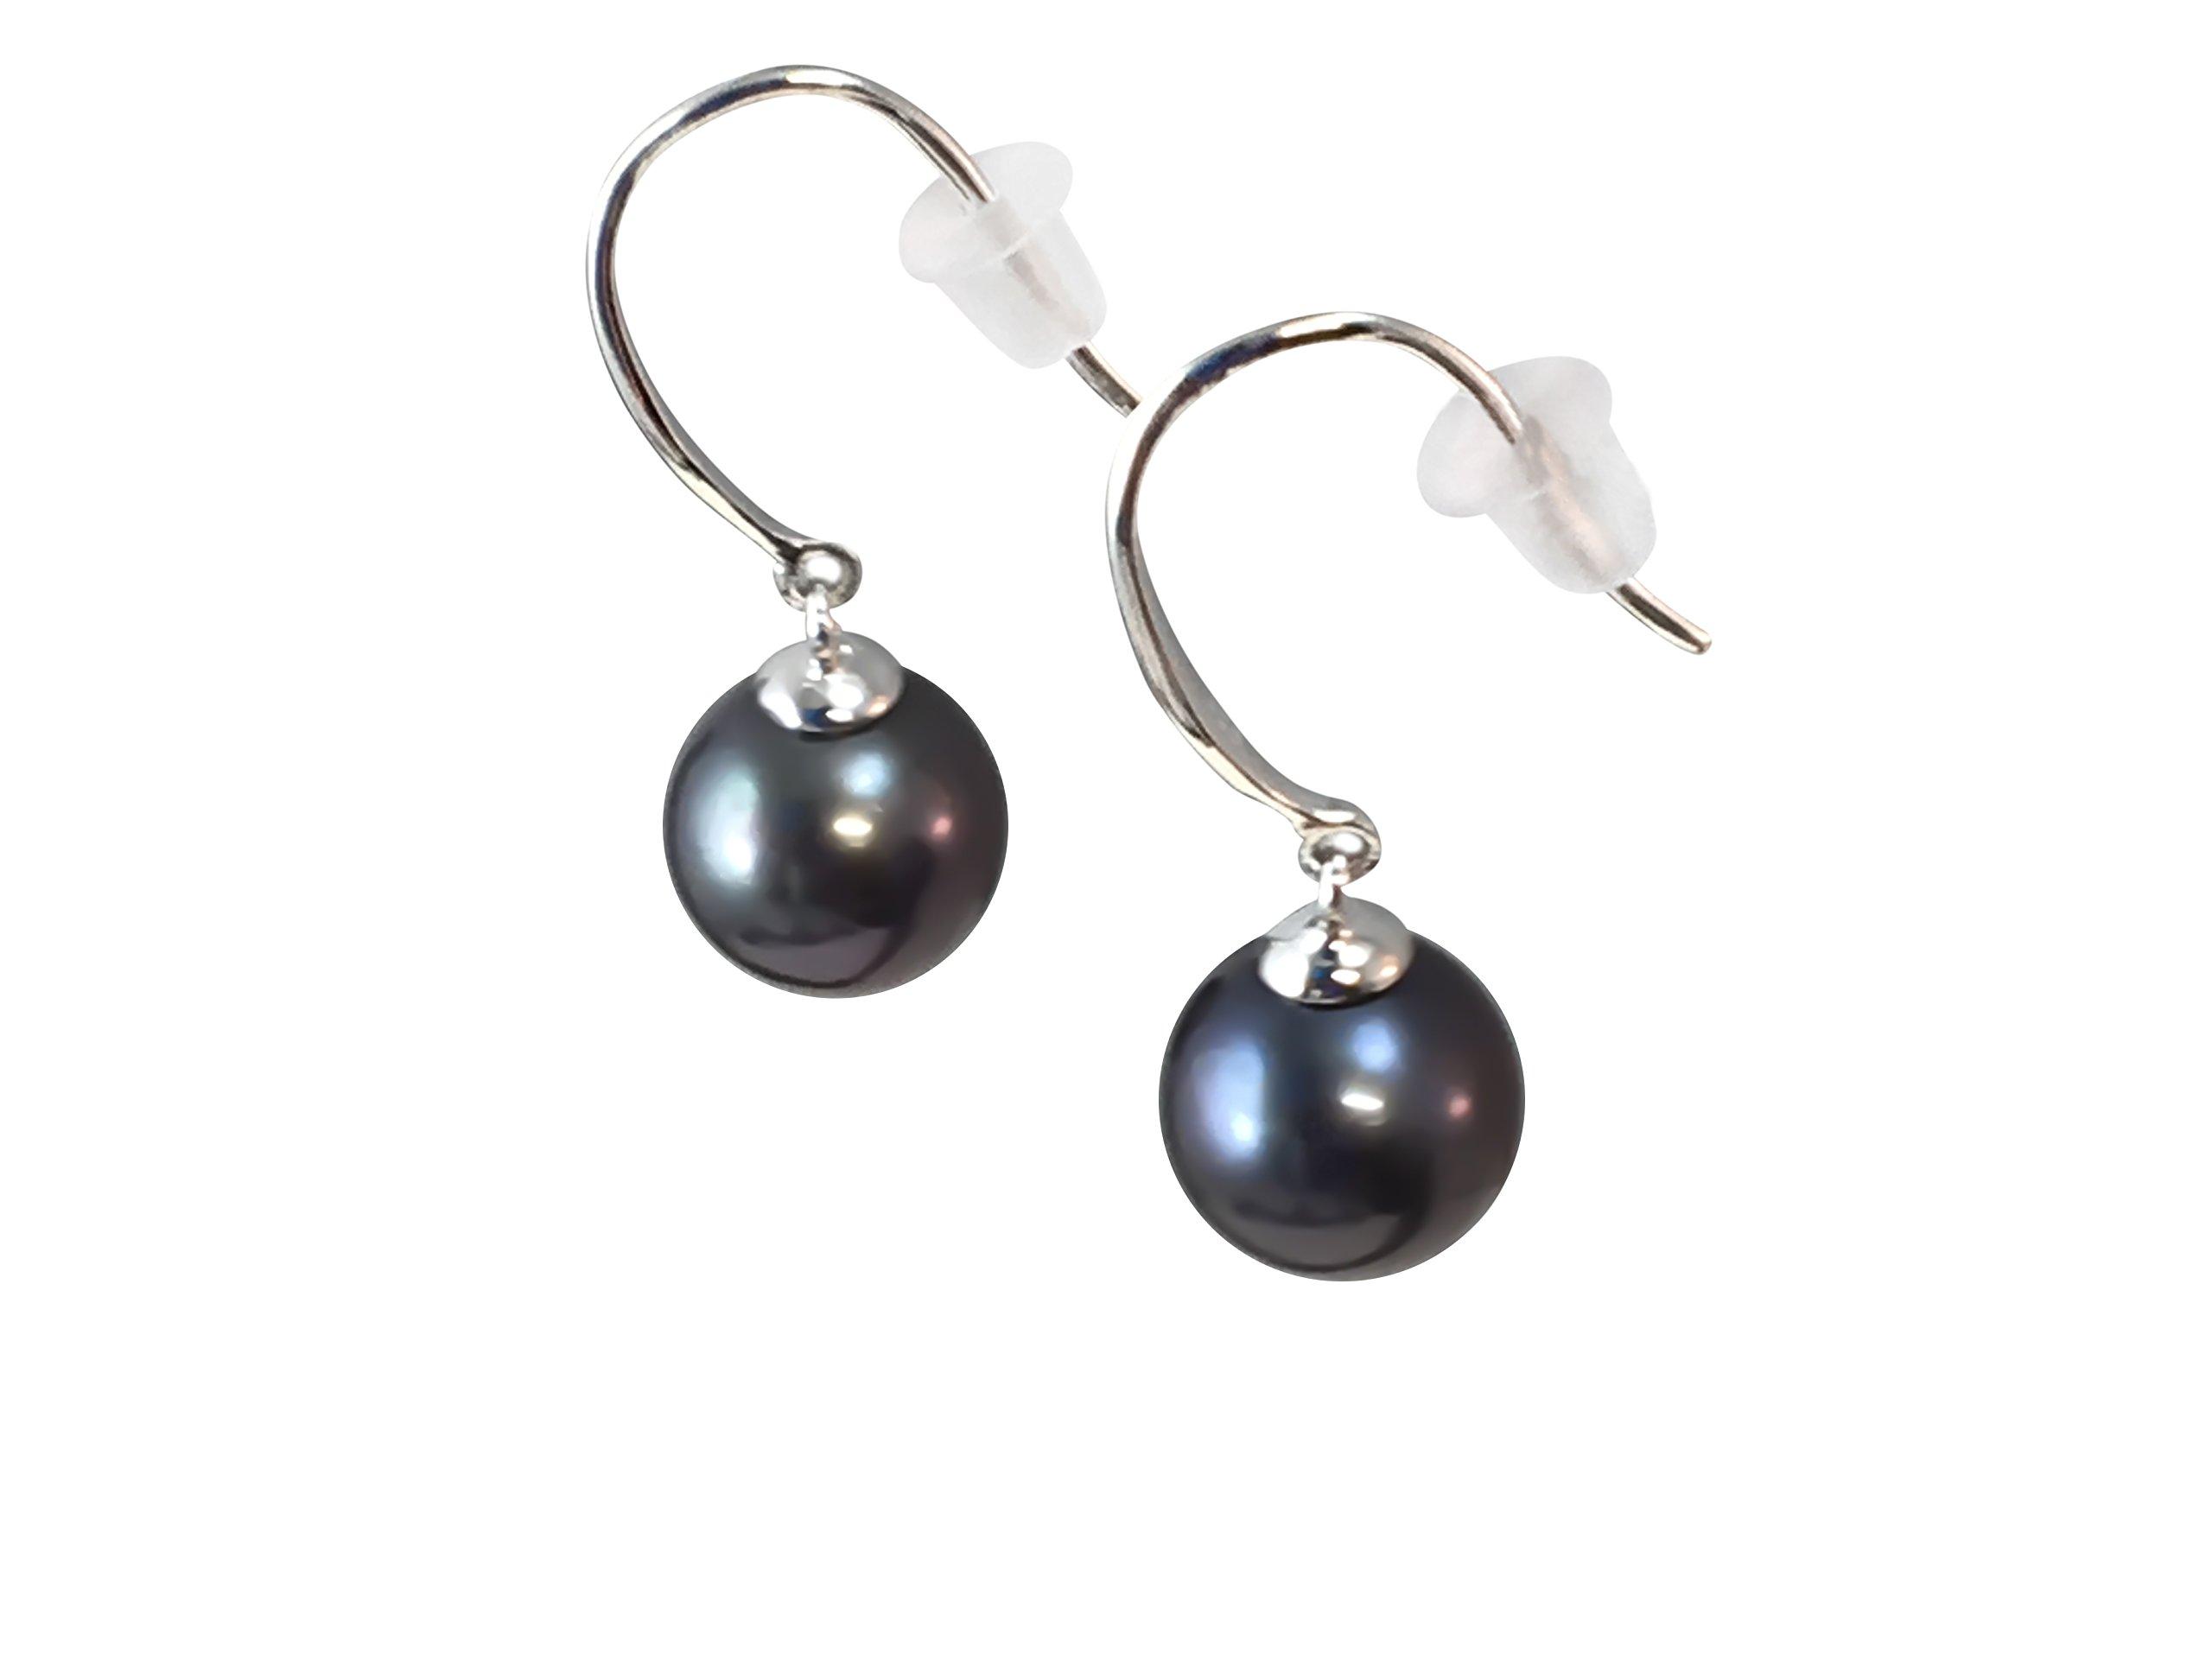 HinsonGayle AAA 8-8.5mm Black Round Freshwater Cultured Pearl Dangle Earrings, Sterling Silver